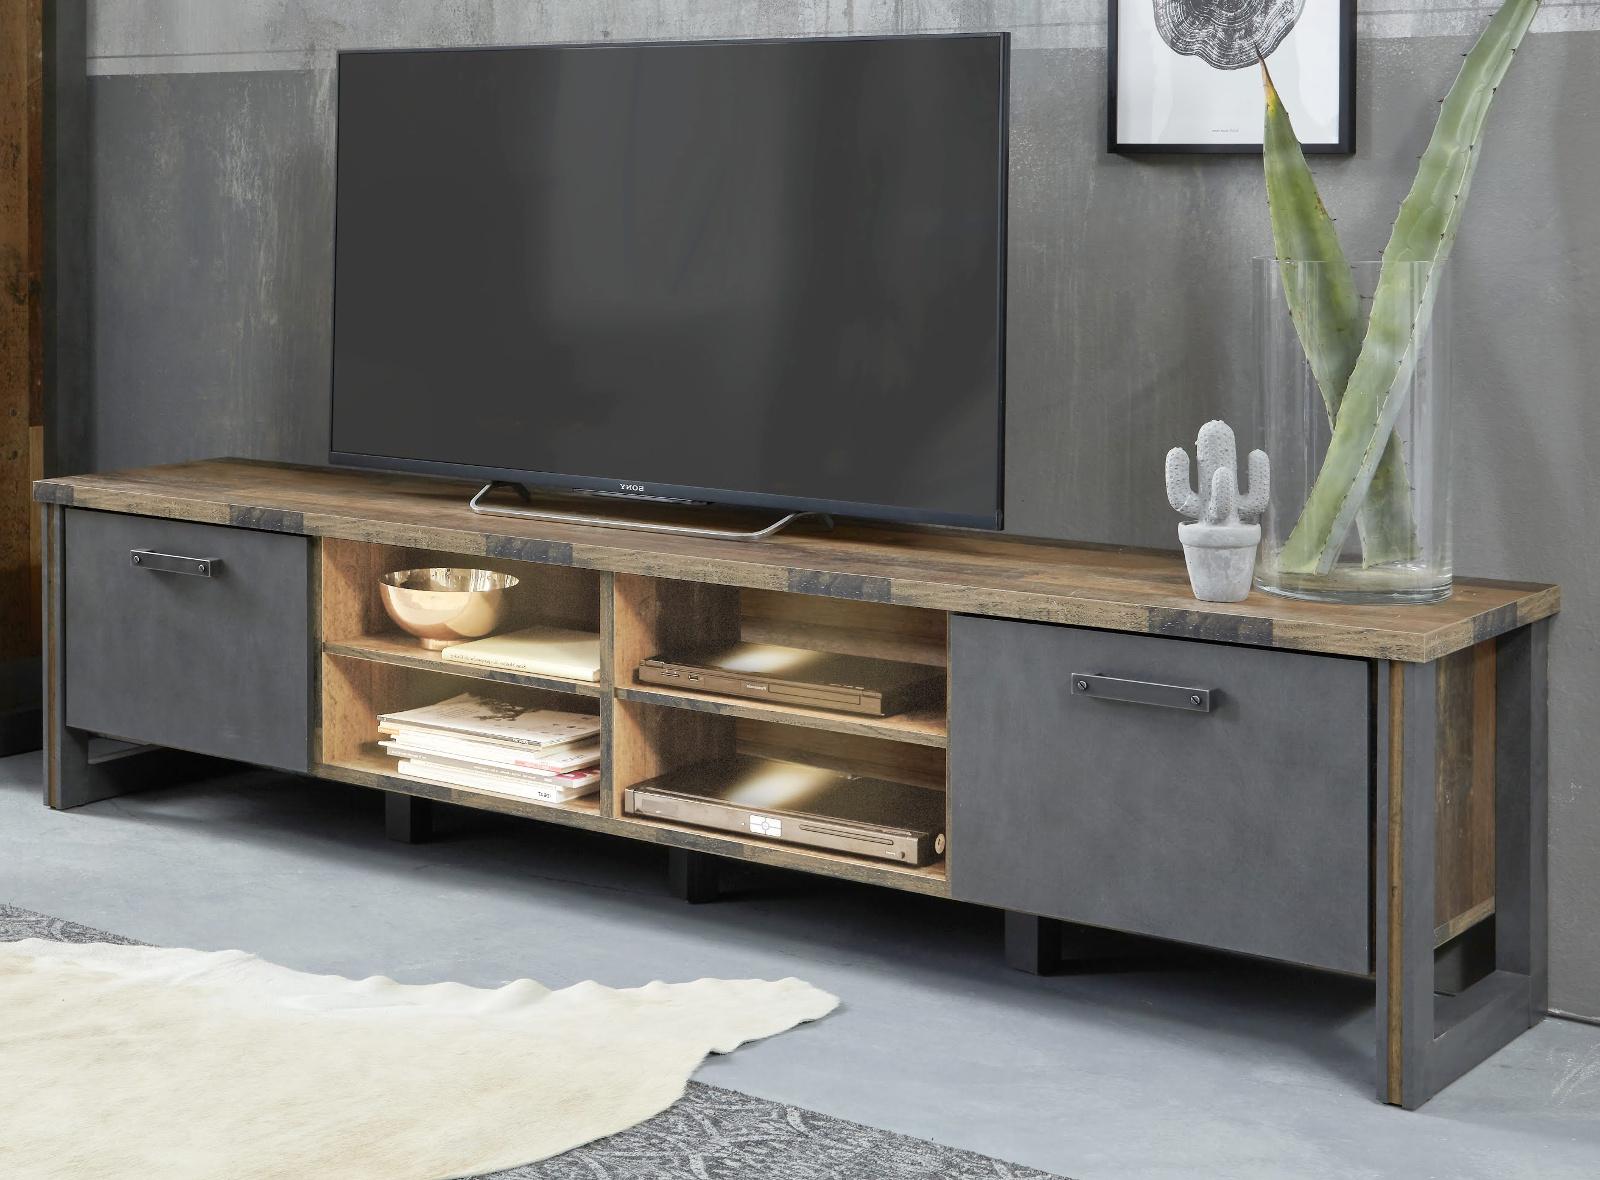 TV-Lowboard Prime in Old Used Wood Design mit Matera grau TV-Unterteil  Shabby 207 x 52 cm